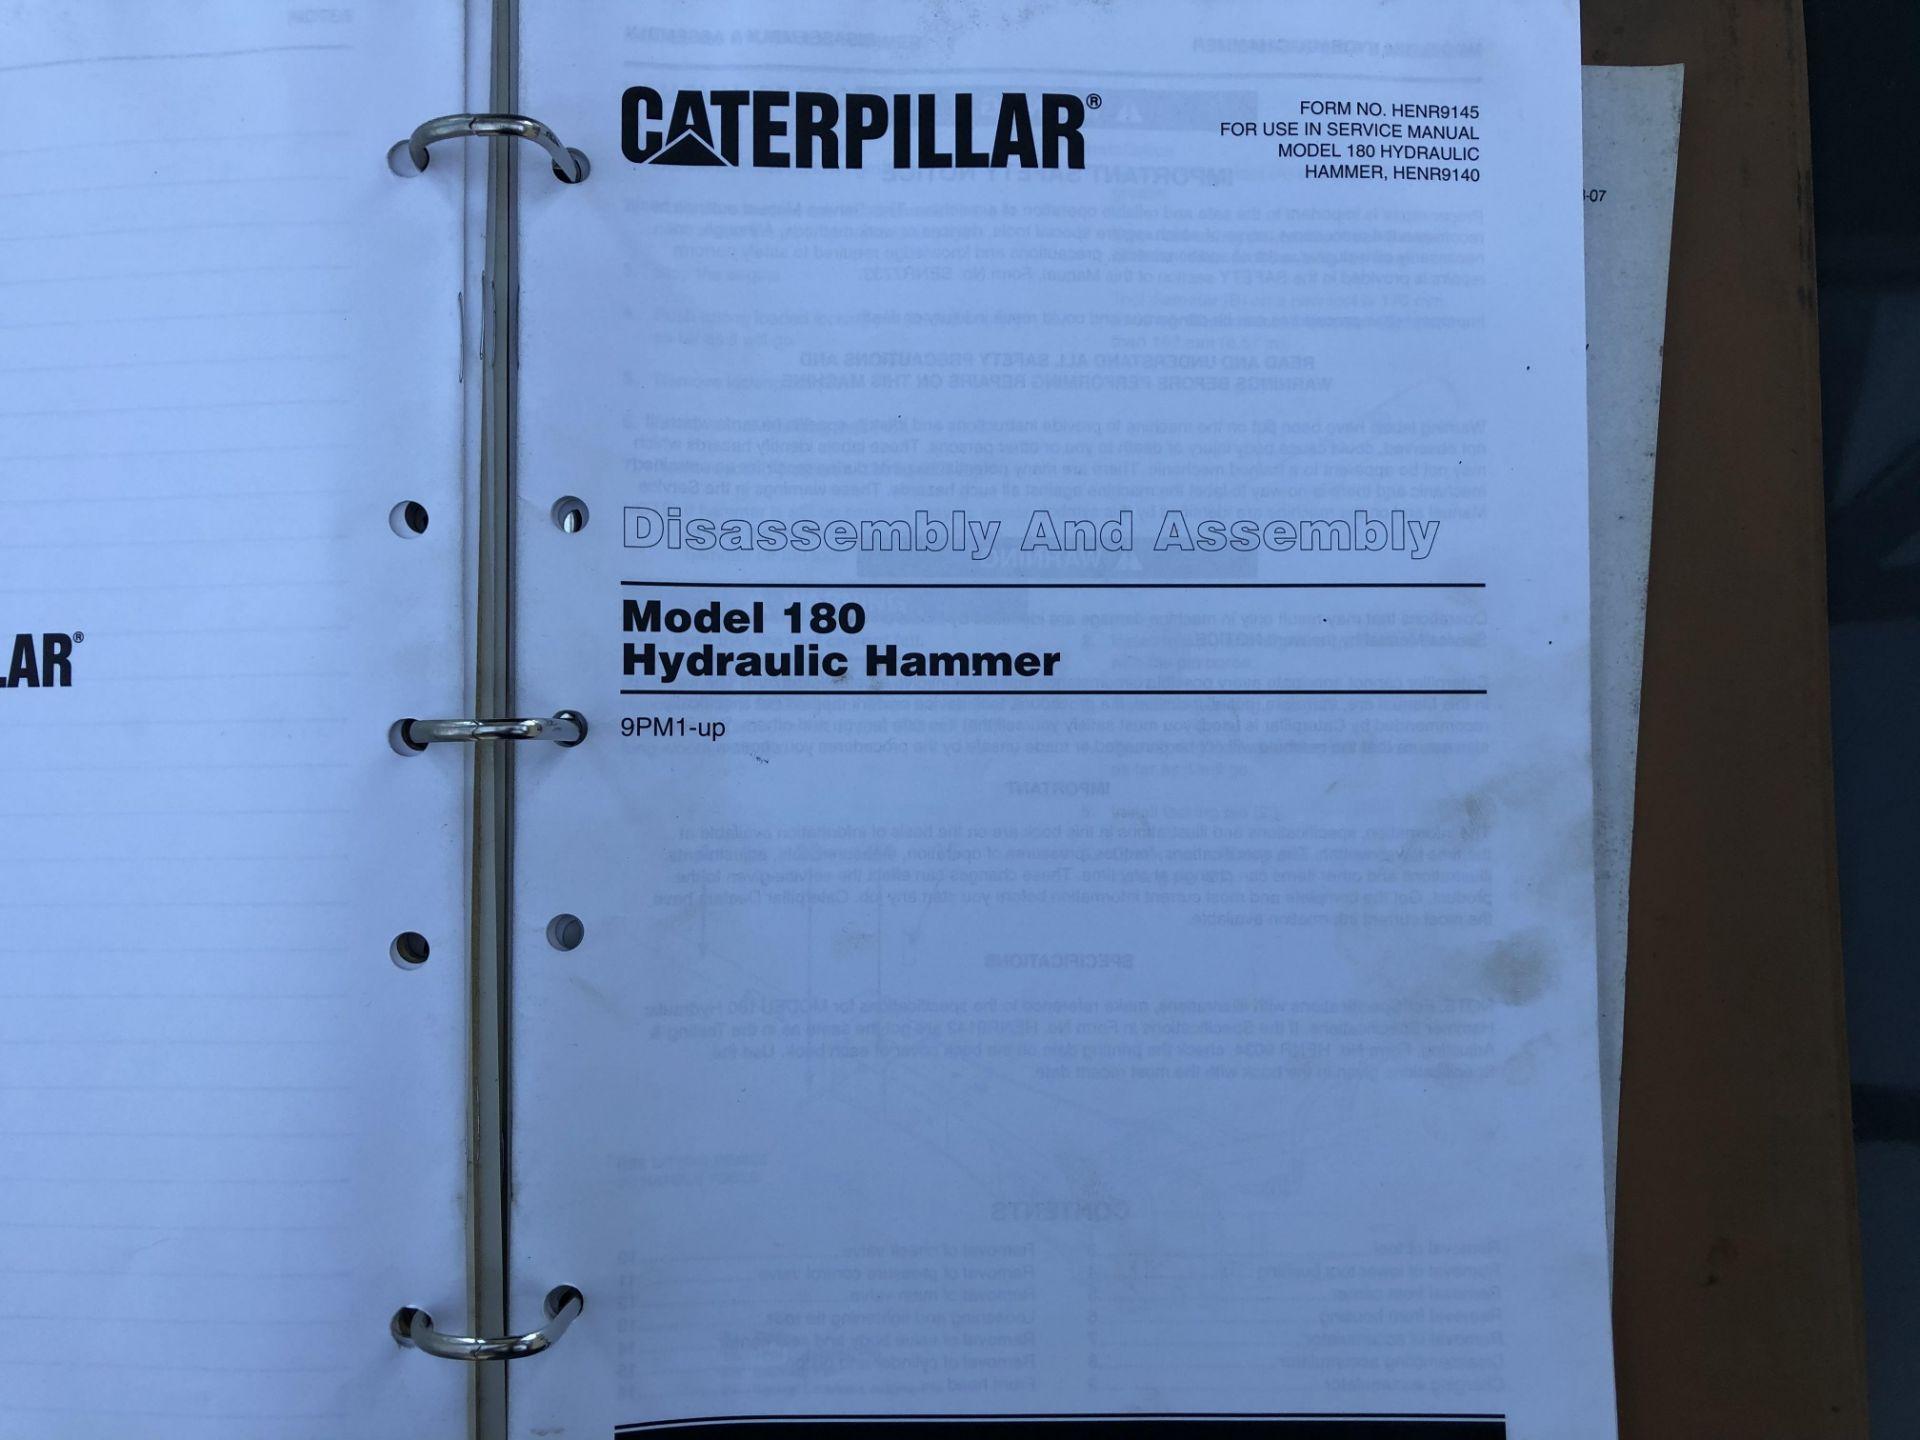 CATERPILLAR MODEL 180 HAMMER SERVICE MANUAL, GENUINE FACTORY CAT WORKSHOP MANUAL - Image 7 of 8